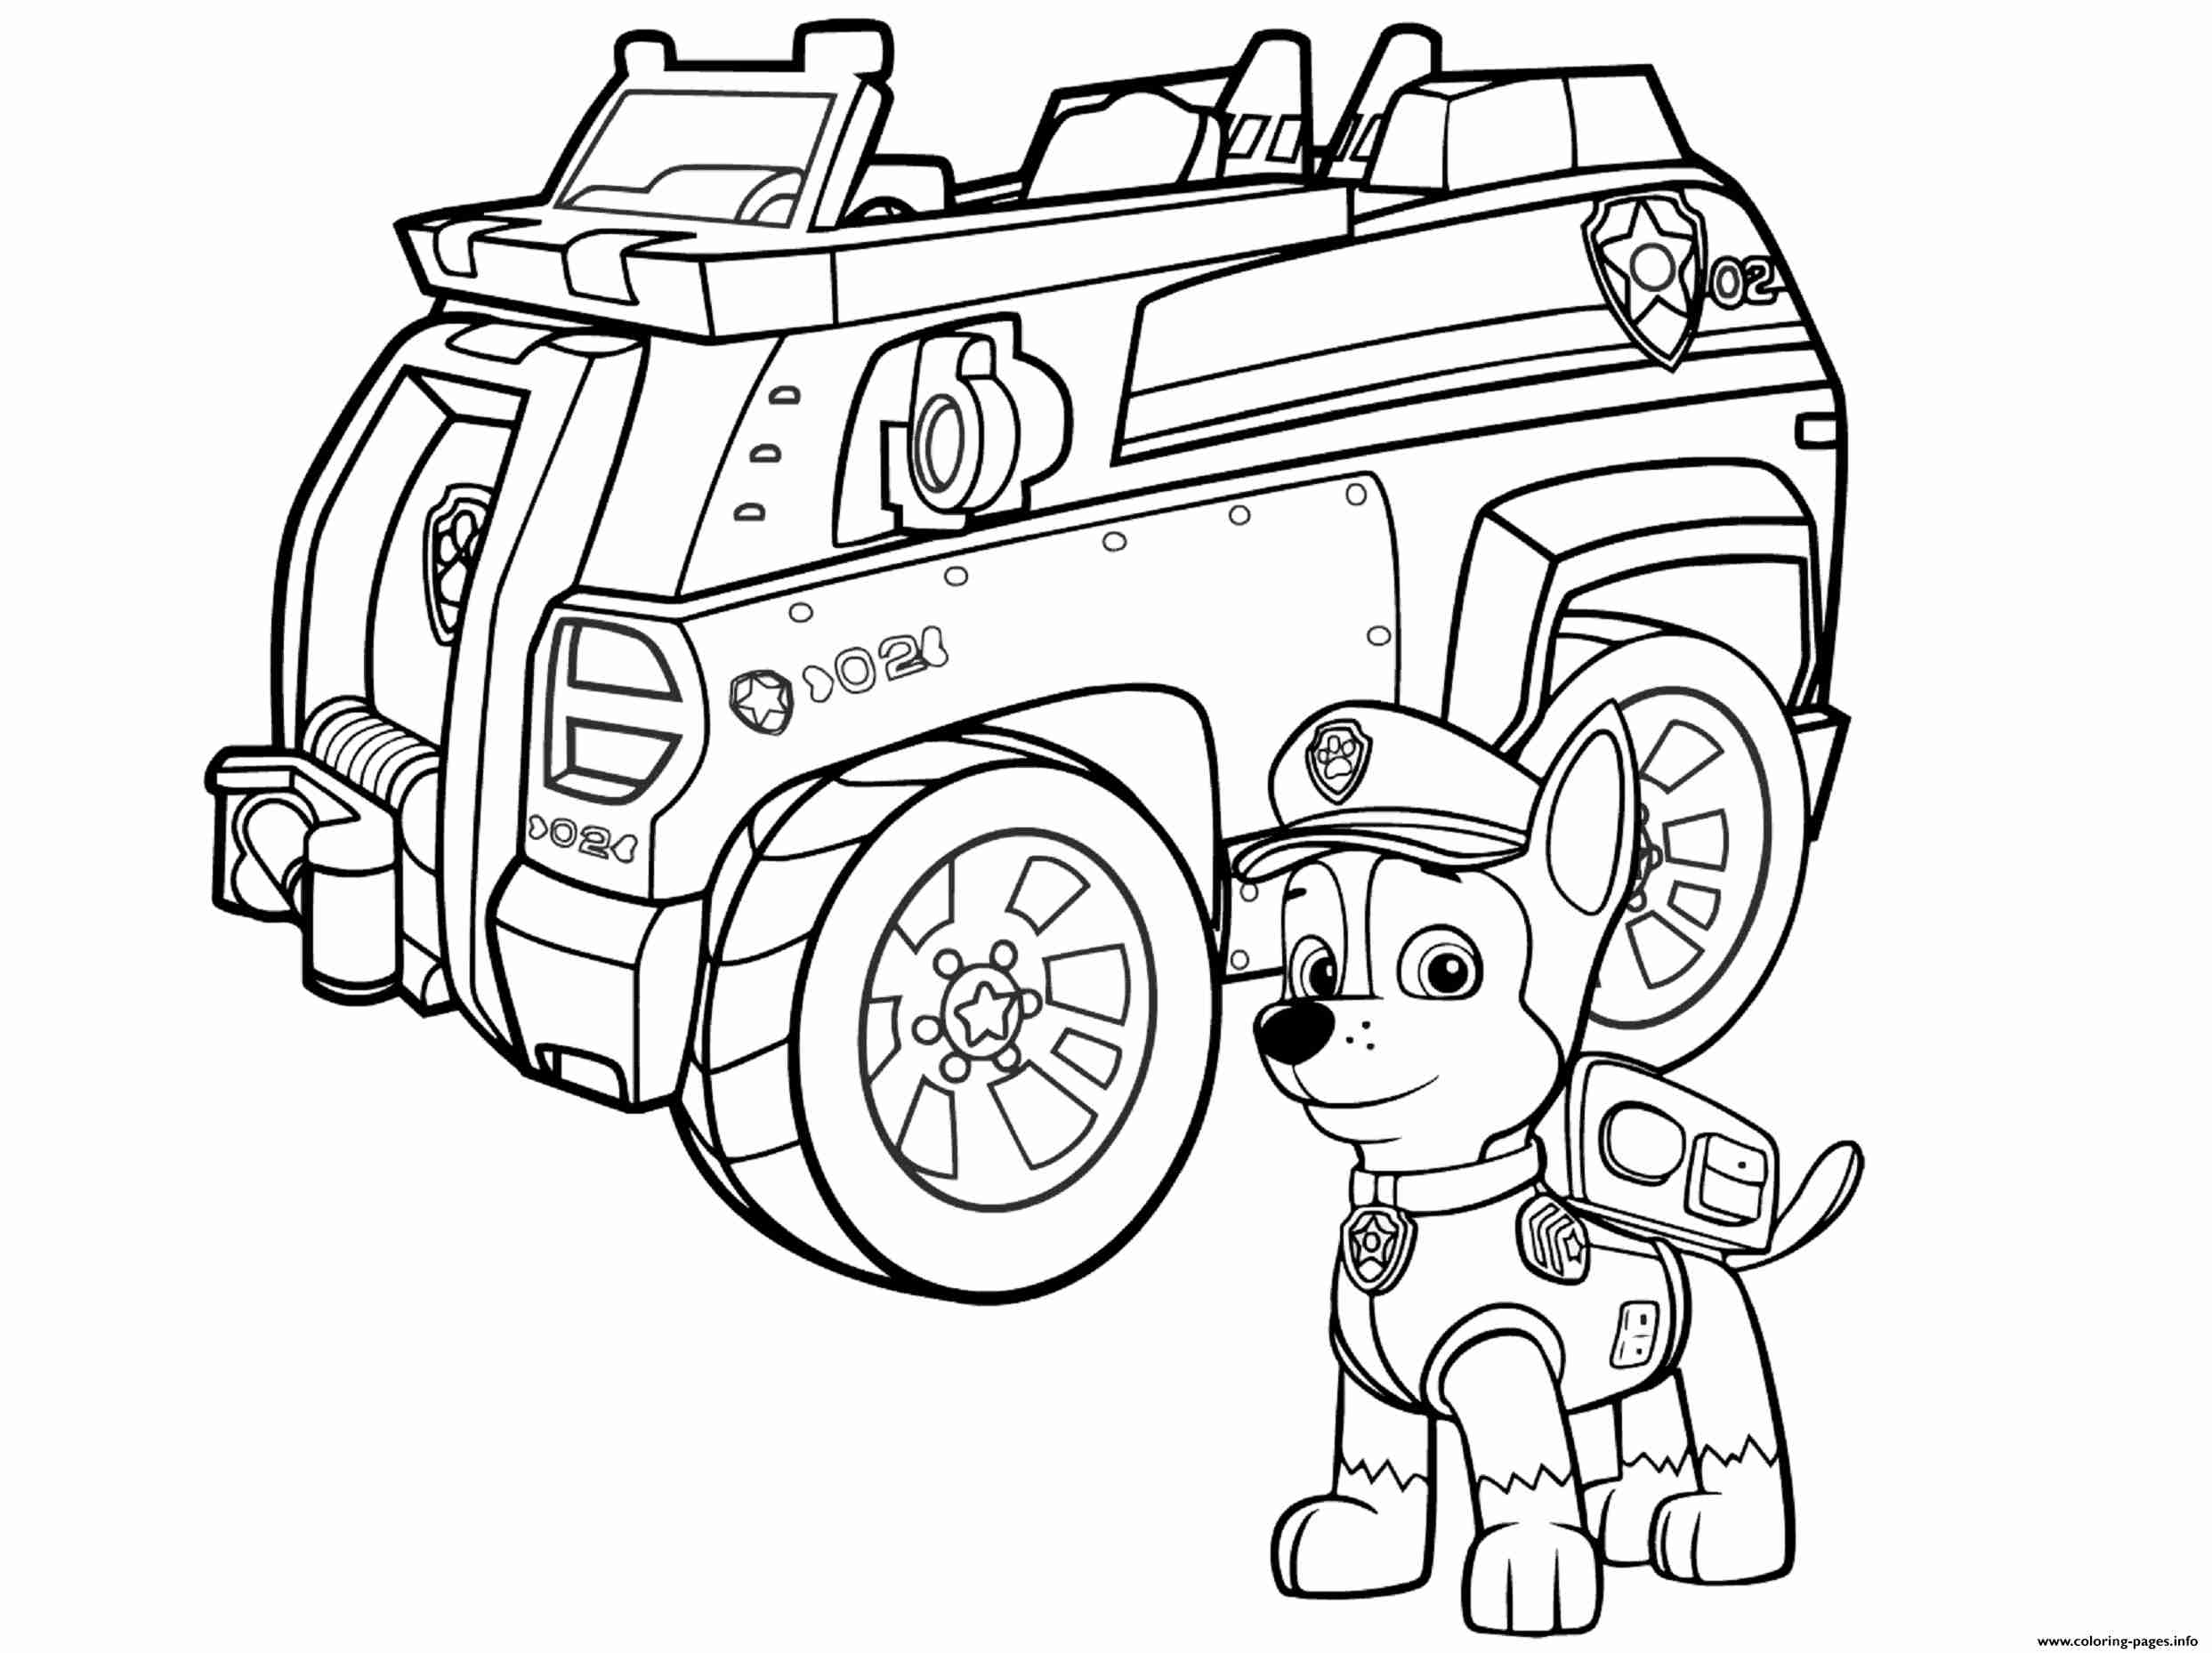 2486x1858 Police Car Coloring Pages Free Printable Also Cop Car Olegratiy